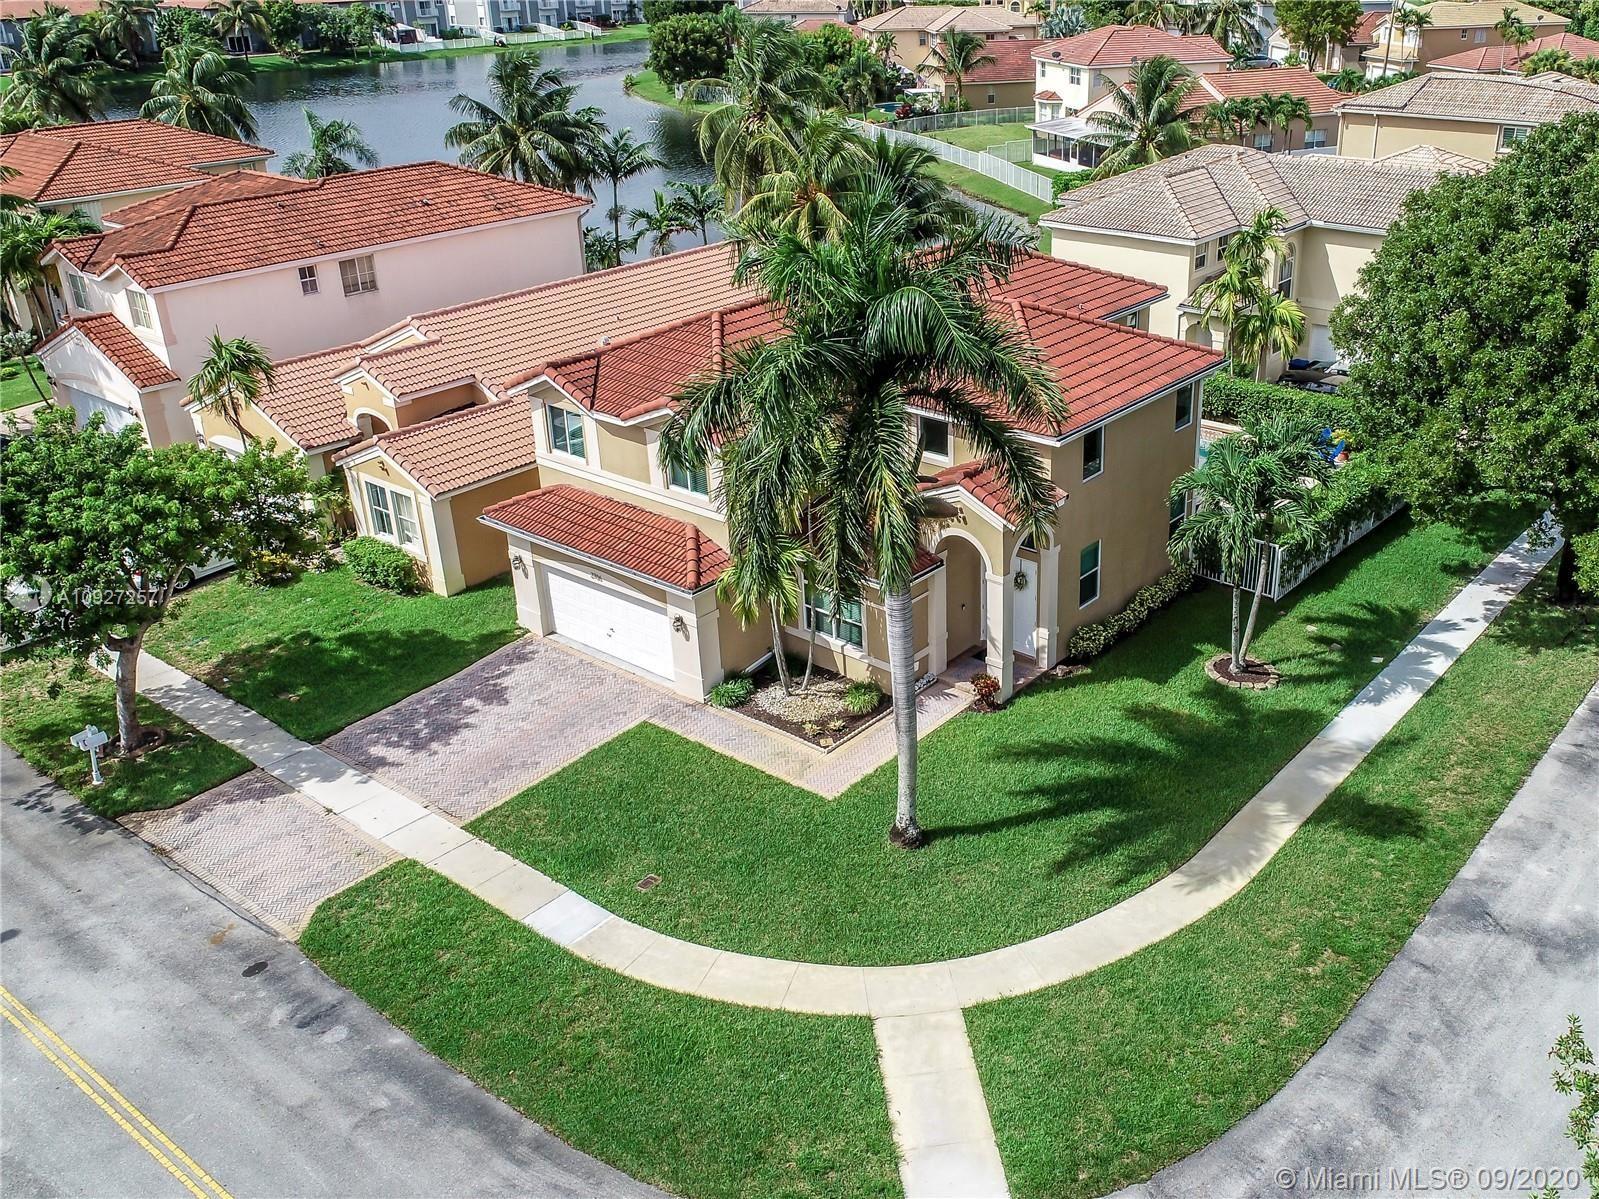 Photo of 2706 SW 129th Ave, Miramar, FL 33027 (MLS # A10927257)